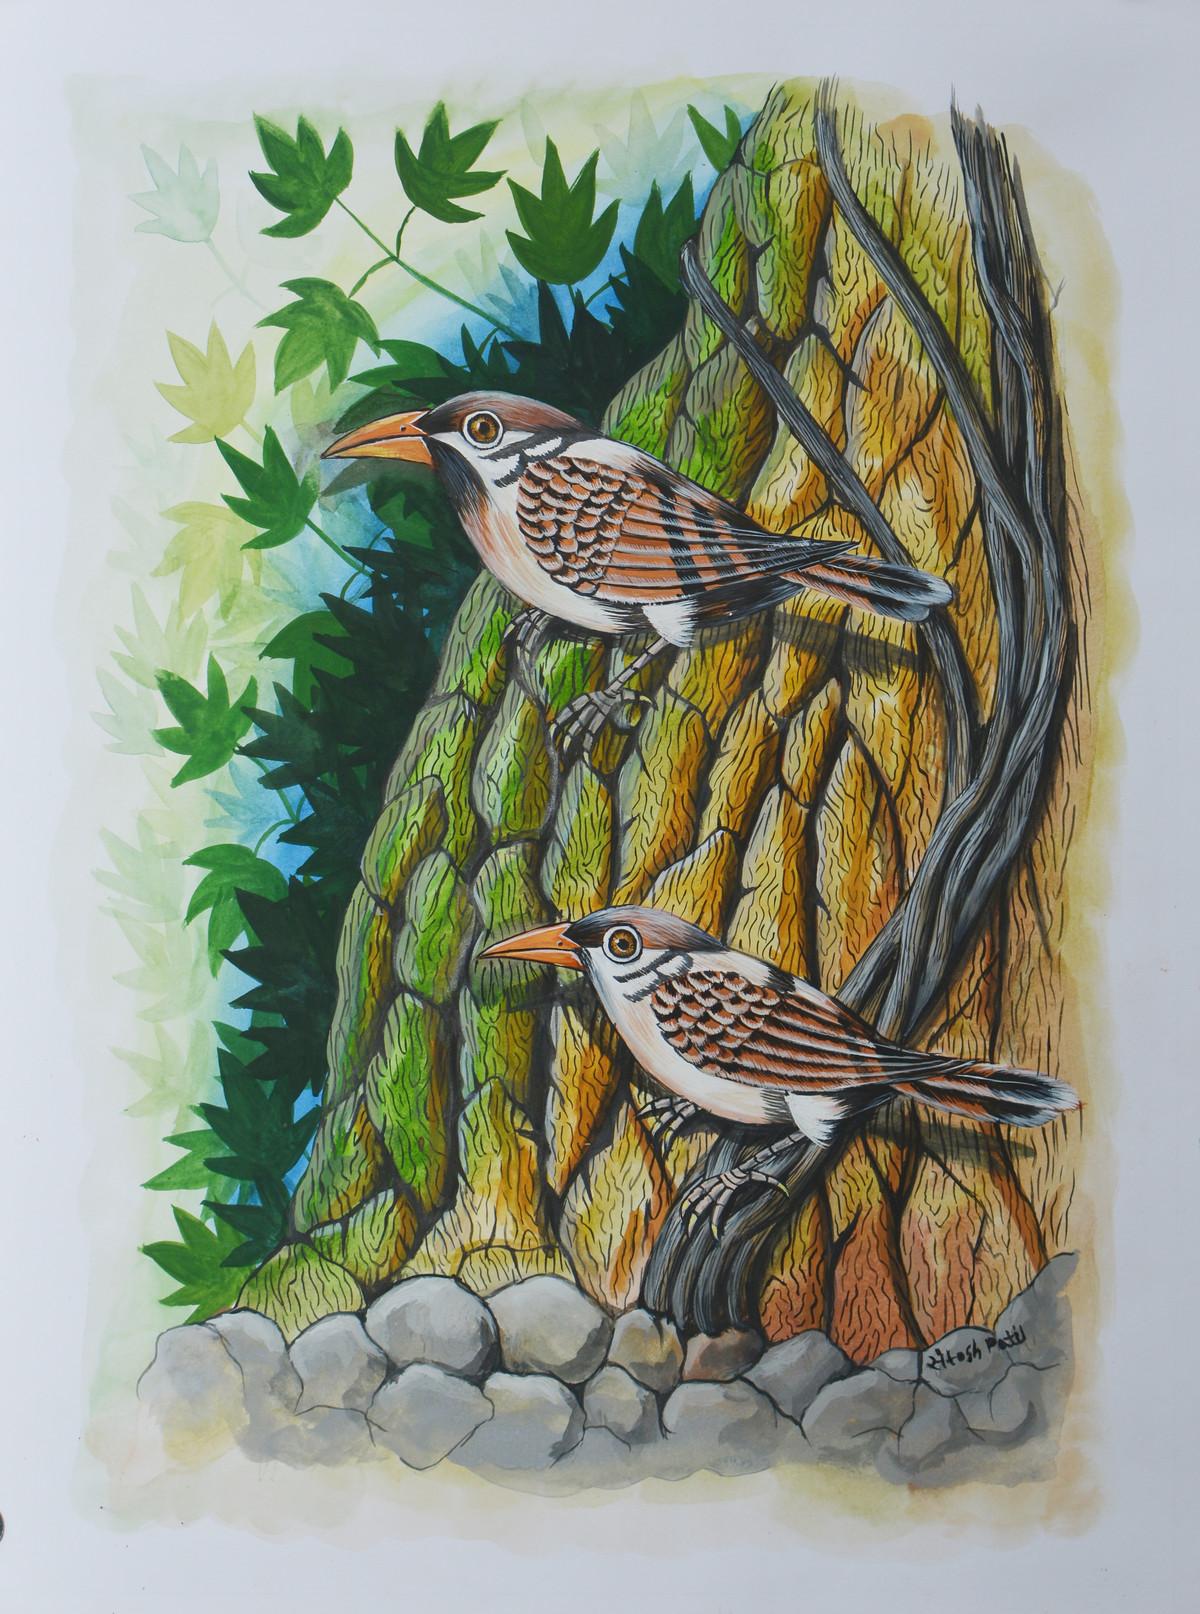 Birds 286 by santosh patil, Decorative Painting, Watercolor on Paper, Lunar Green color